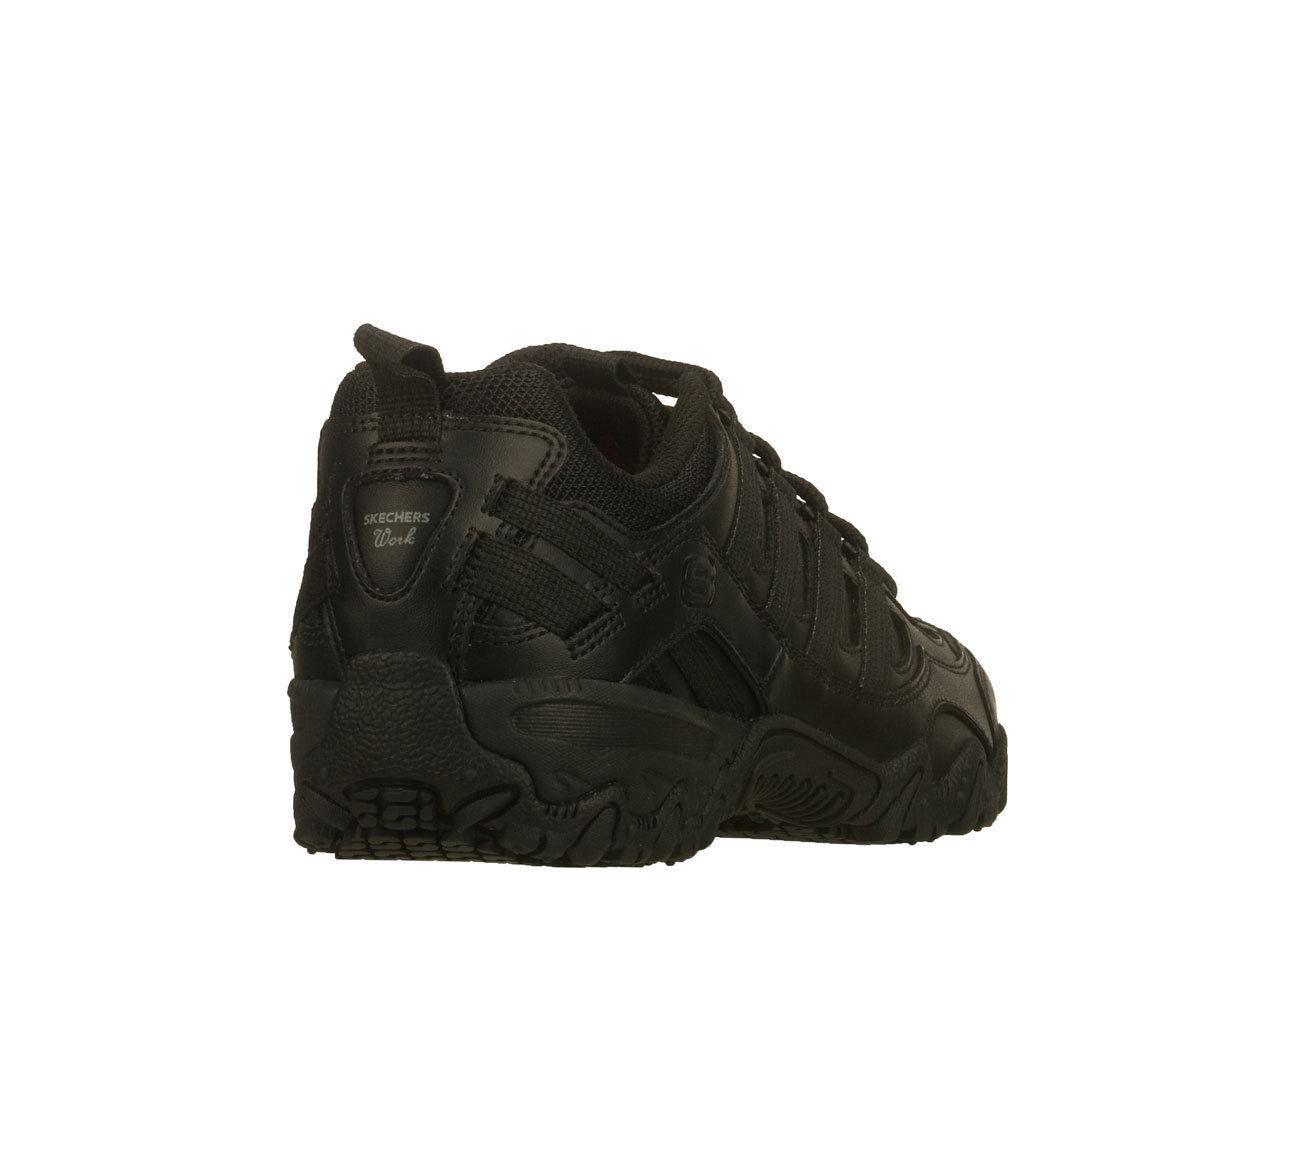 comforter men resistant work comfort comfortable s black slip skechers pin shoes occupational mesh sporty on